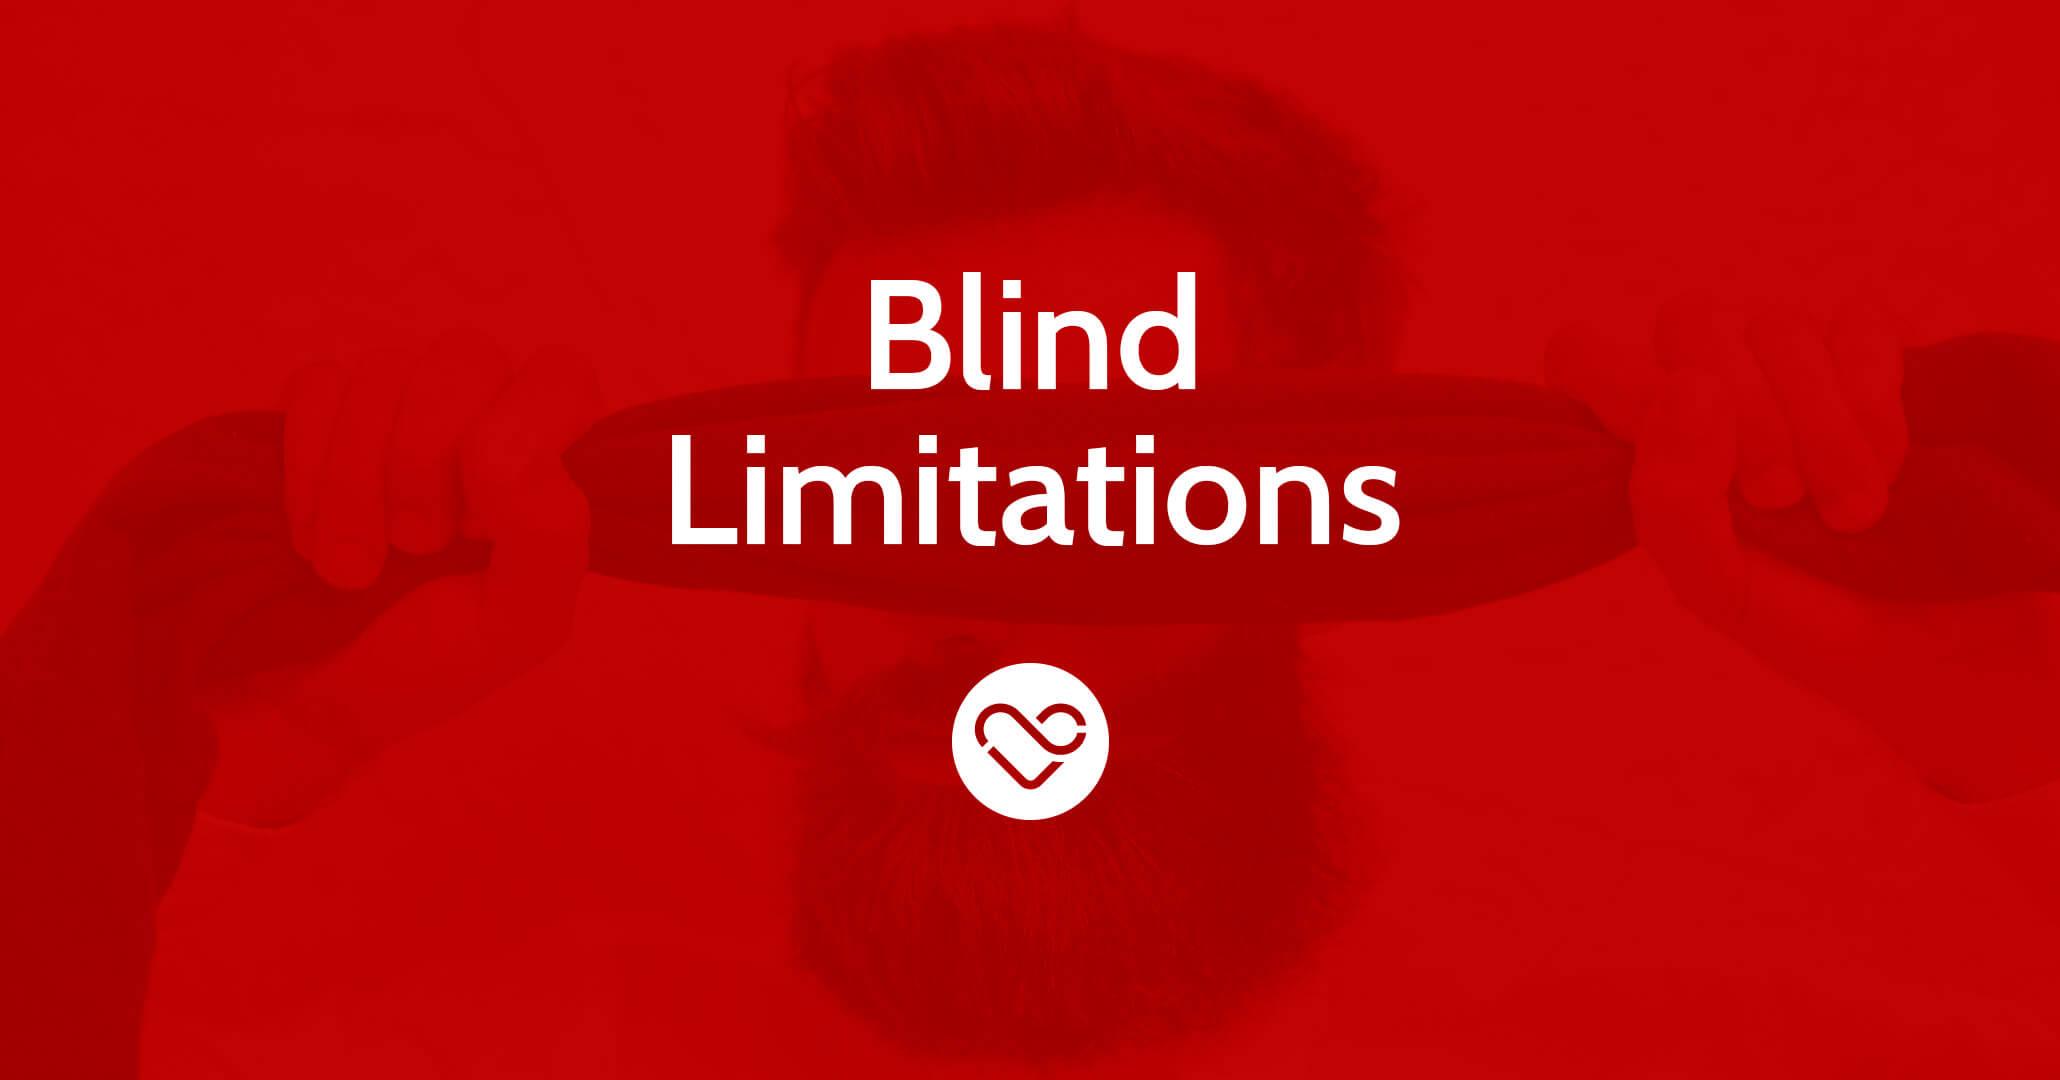 Blind Limitations